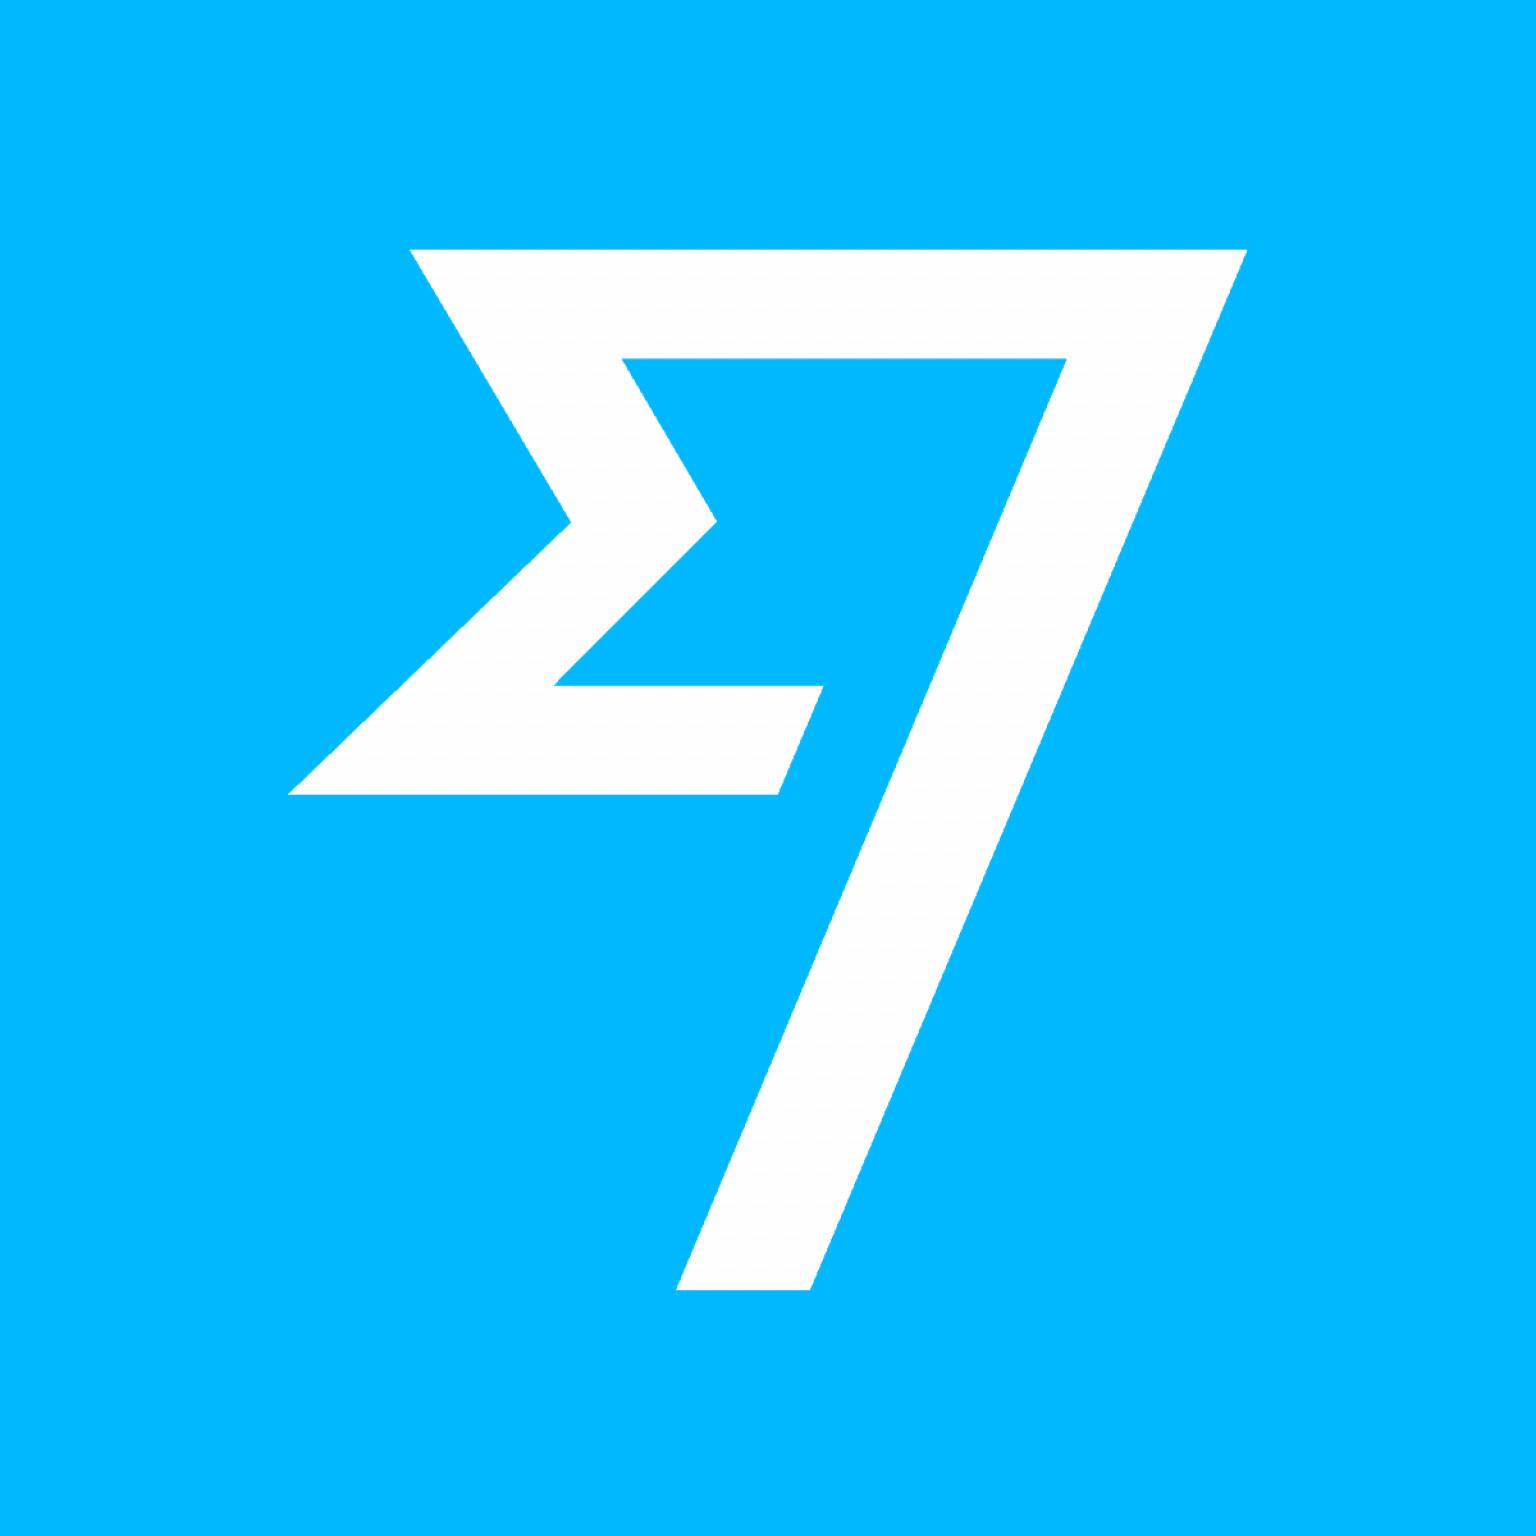 Logo of money transfer service Wise